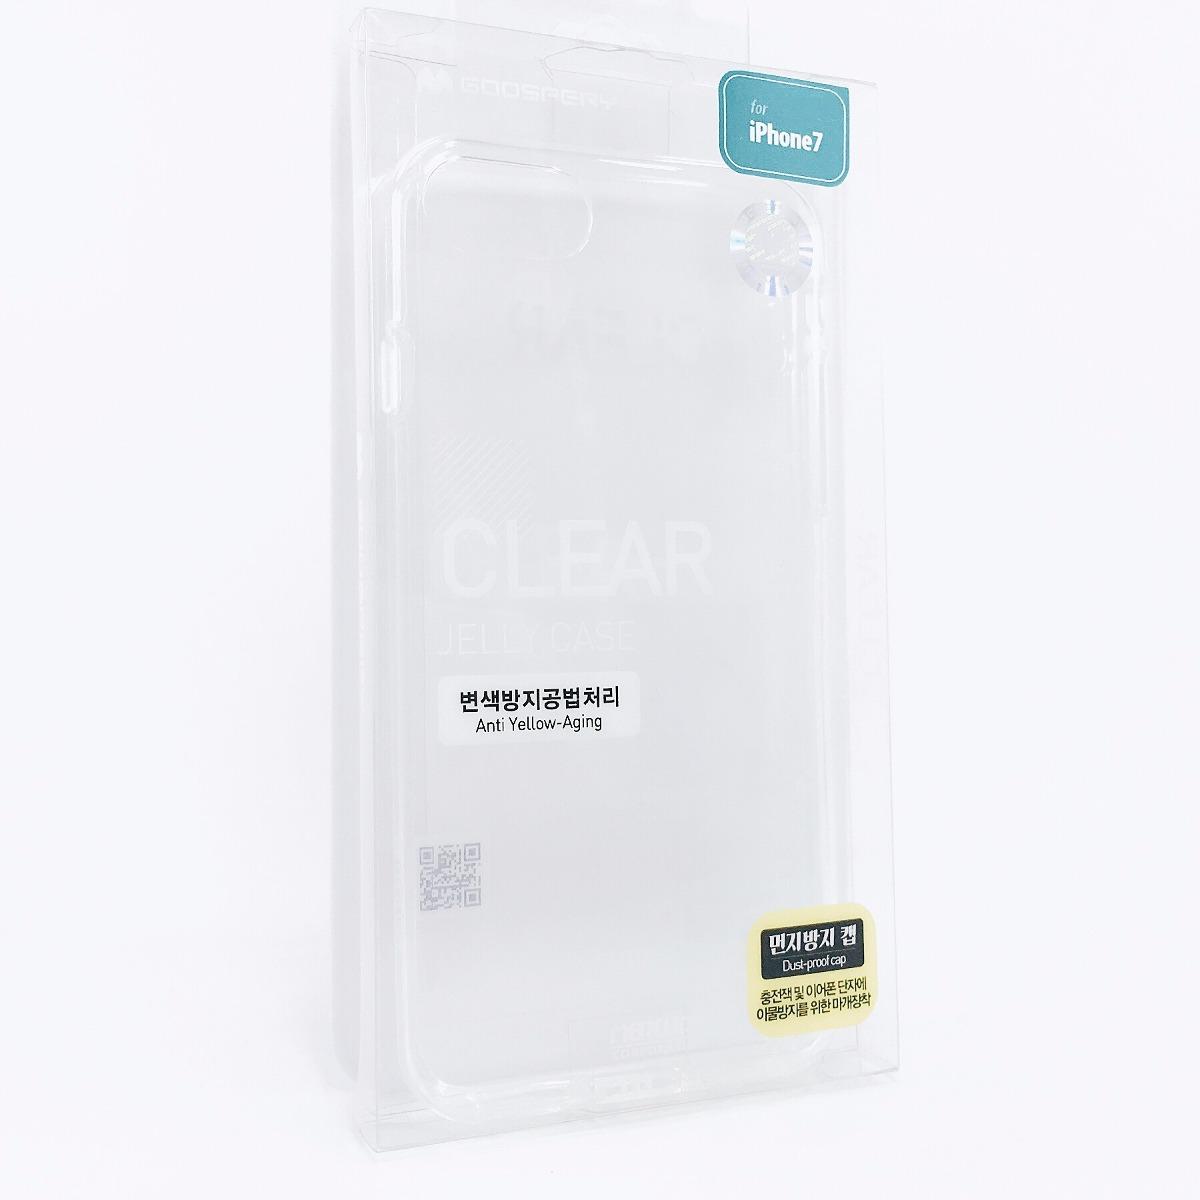 Funda Jelly Case Iphone 7 Transparente Gel Flexible Suave